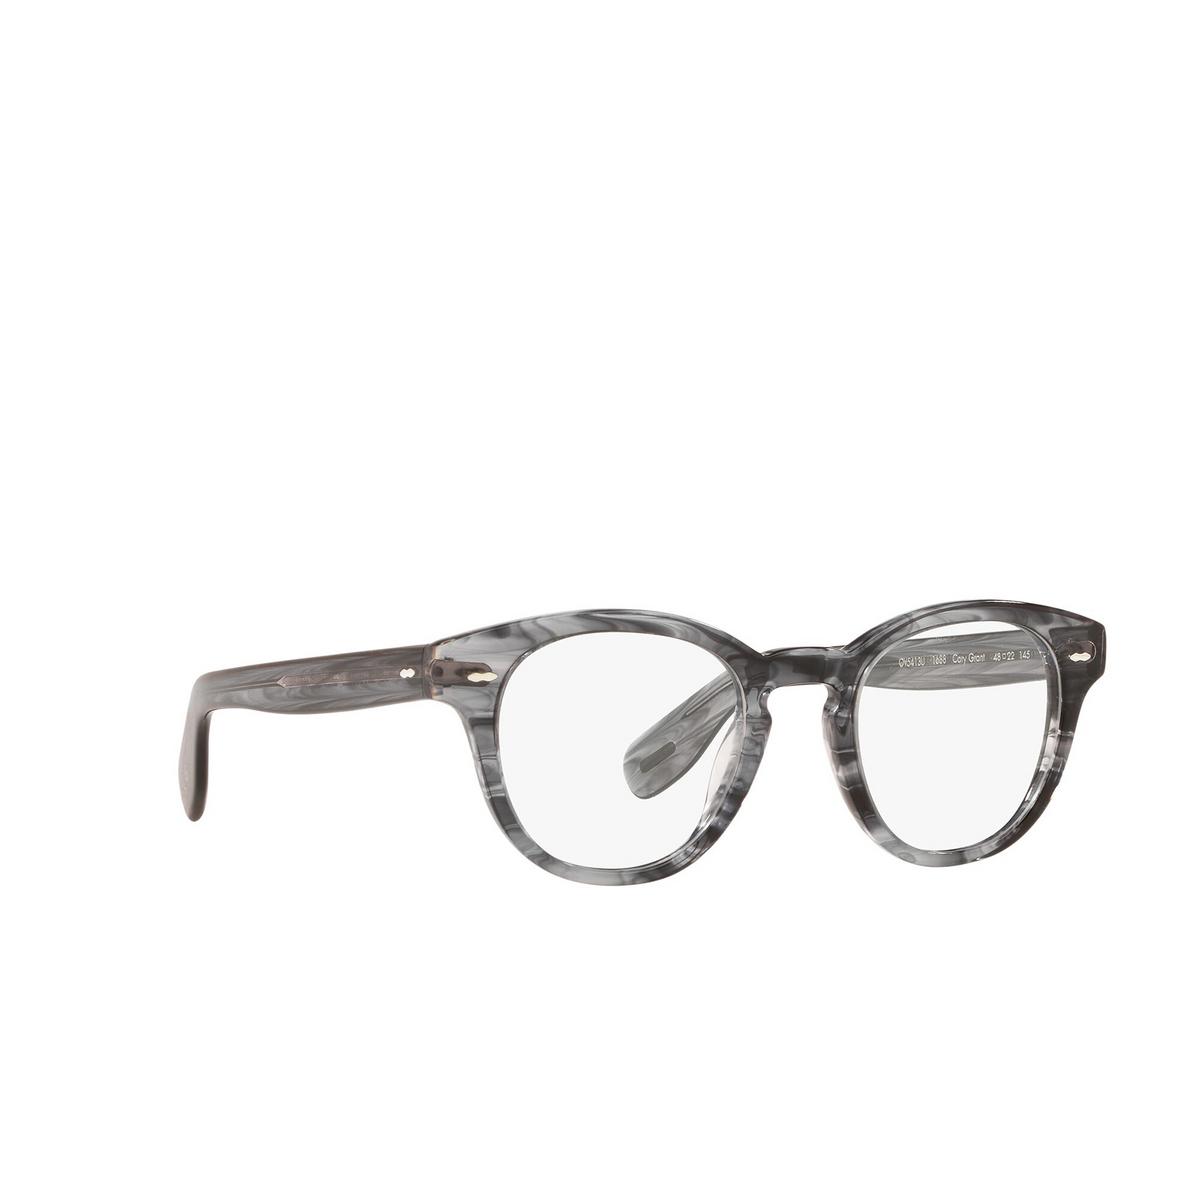 Oliver Peoples® Square Eyeglasses: Cary Grant OV5413U color Navy Smoke 1688 - three-quarters view.